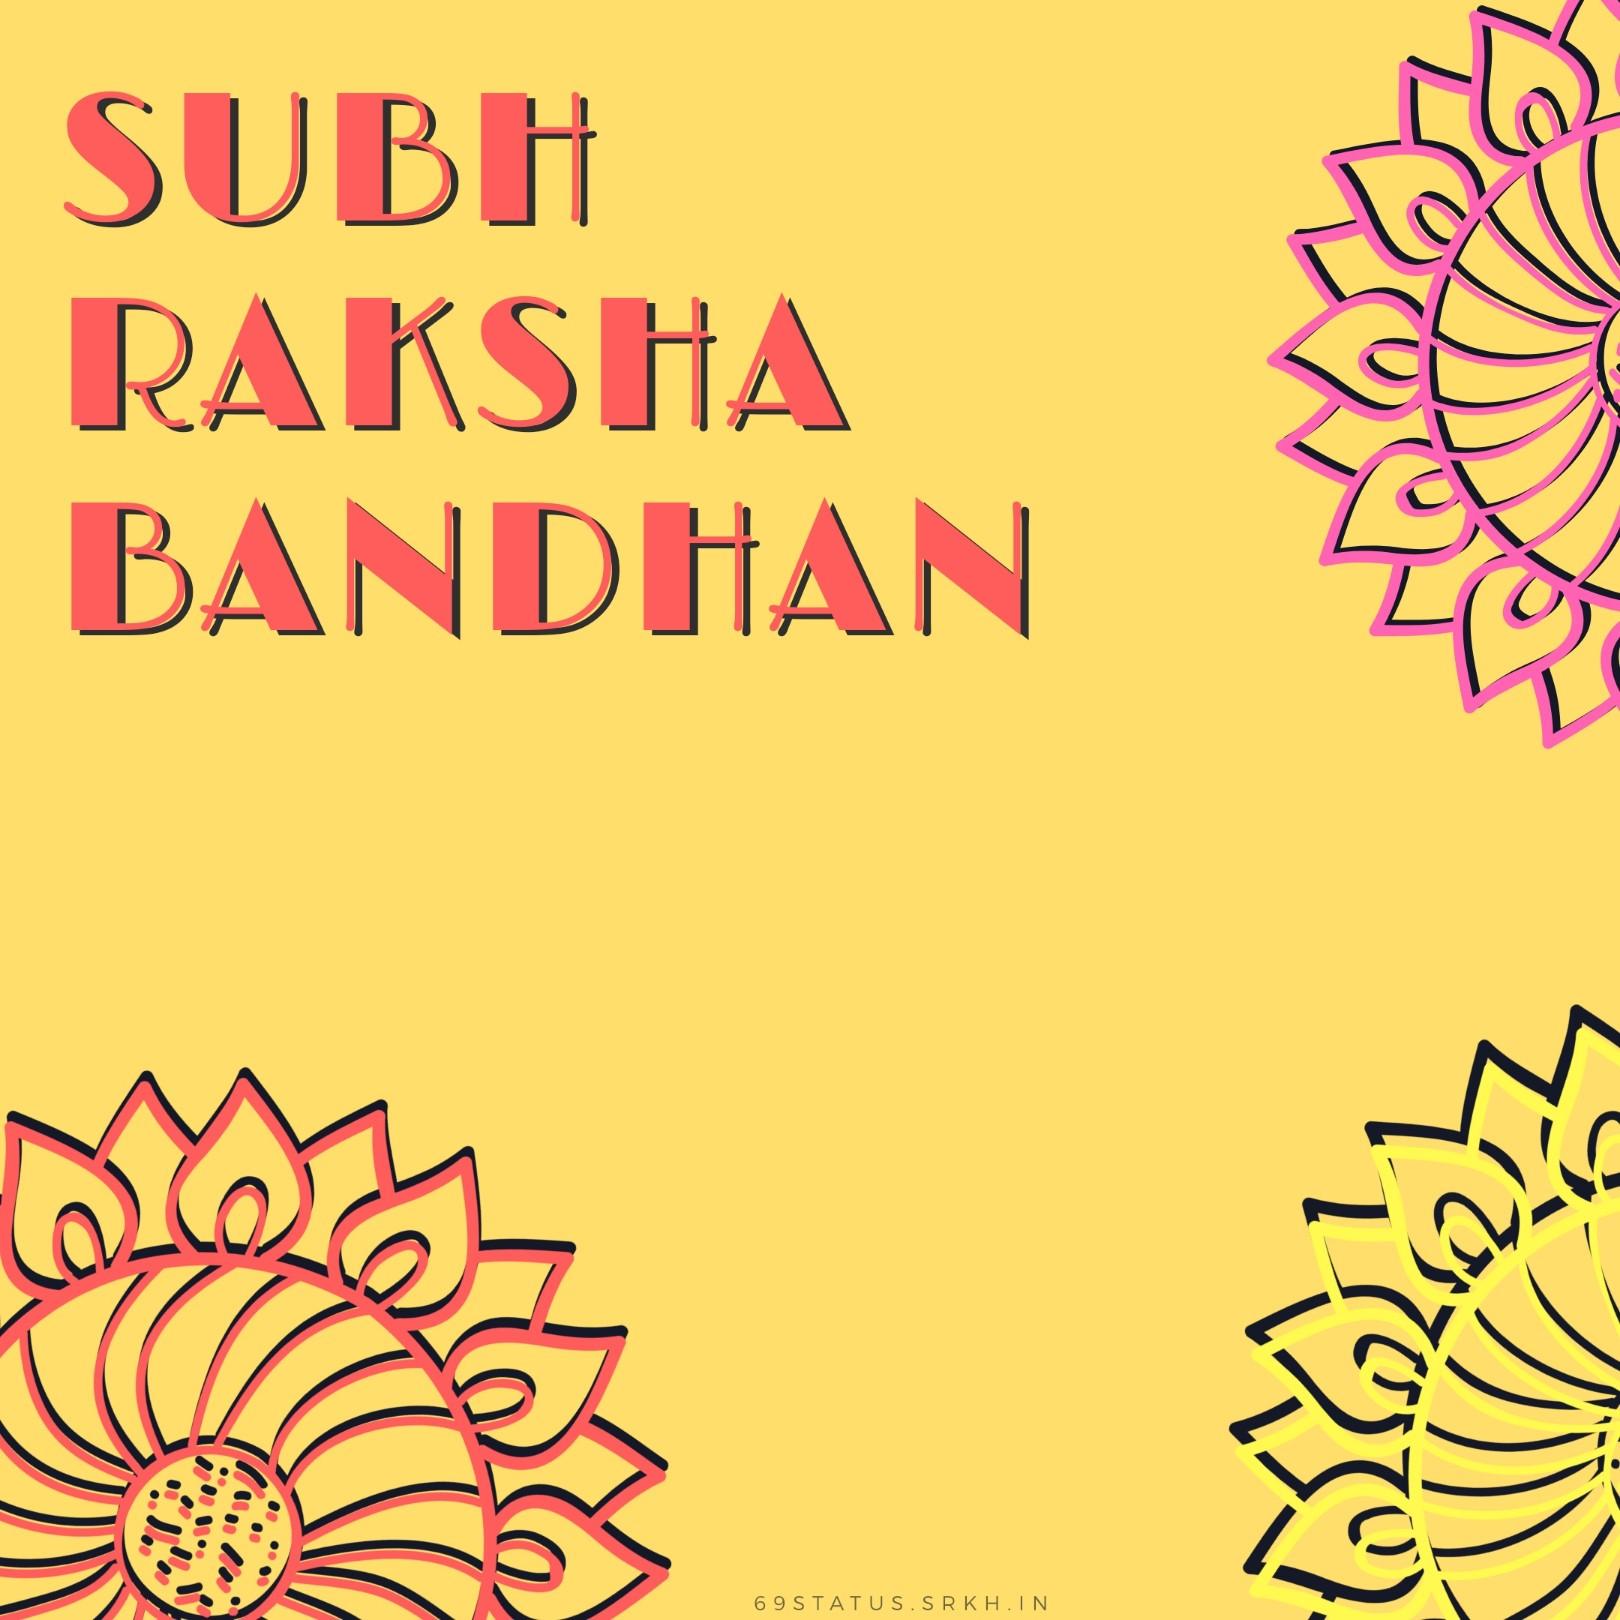 Subh Raksha Bandhan Images full HD free download.